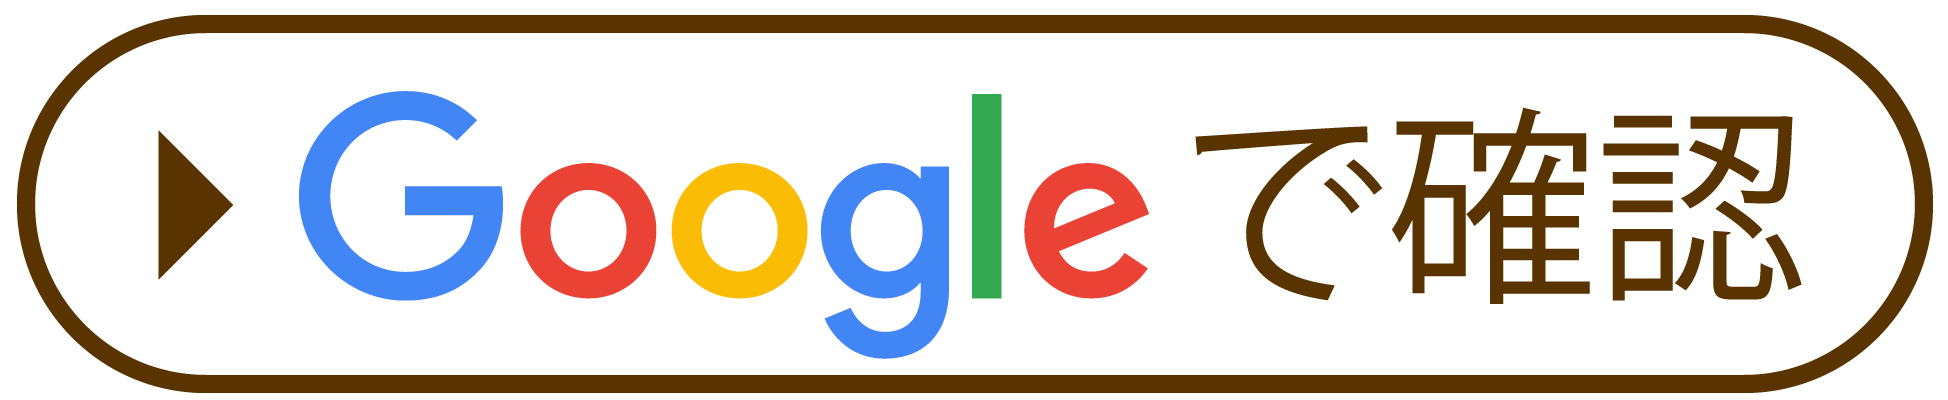 GoogleMapsで確認